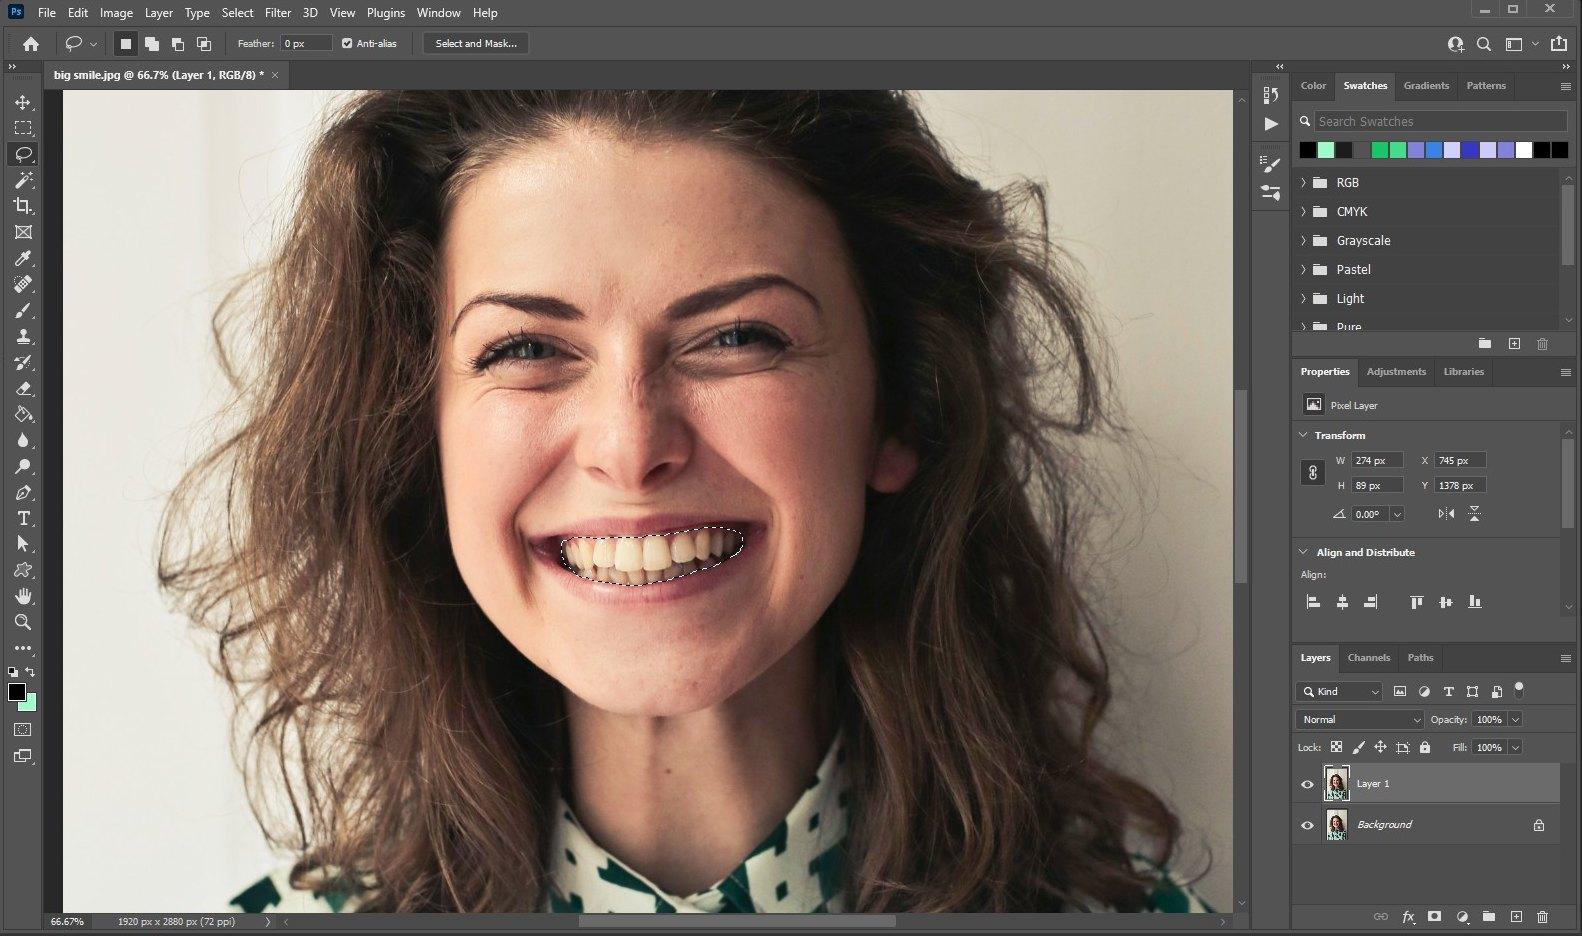 how to whiten teeth photoshop - 2